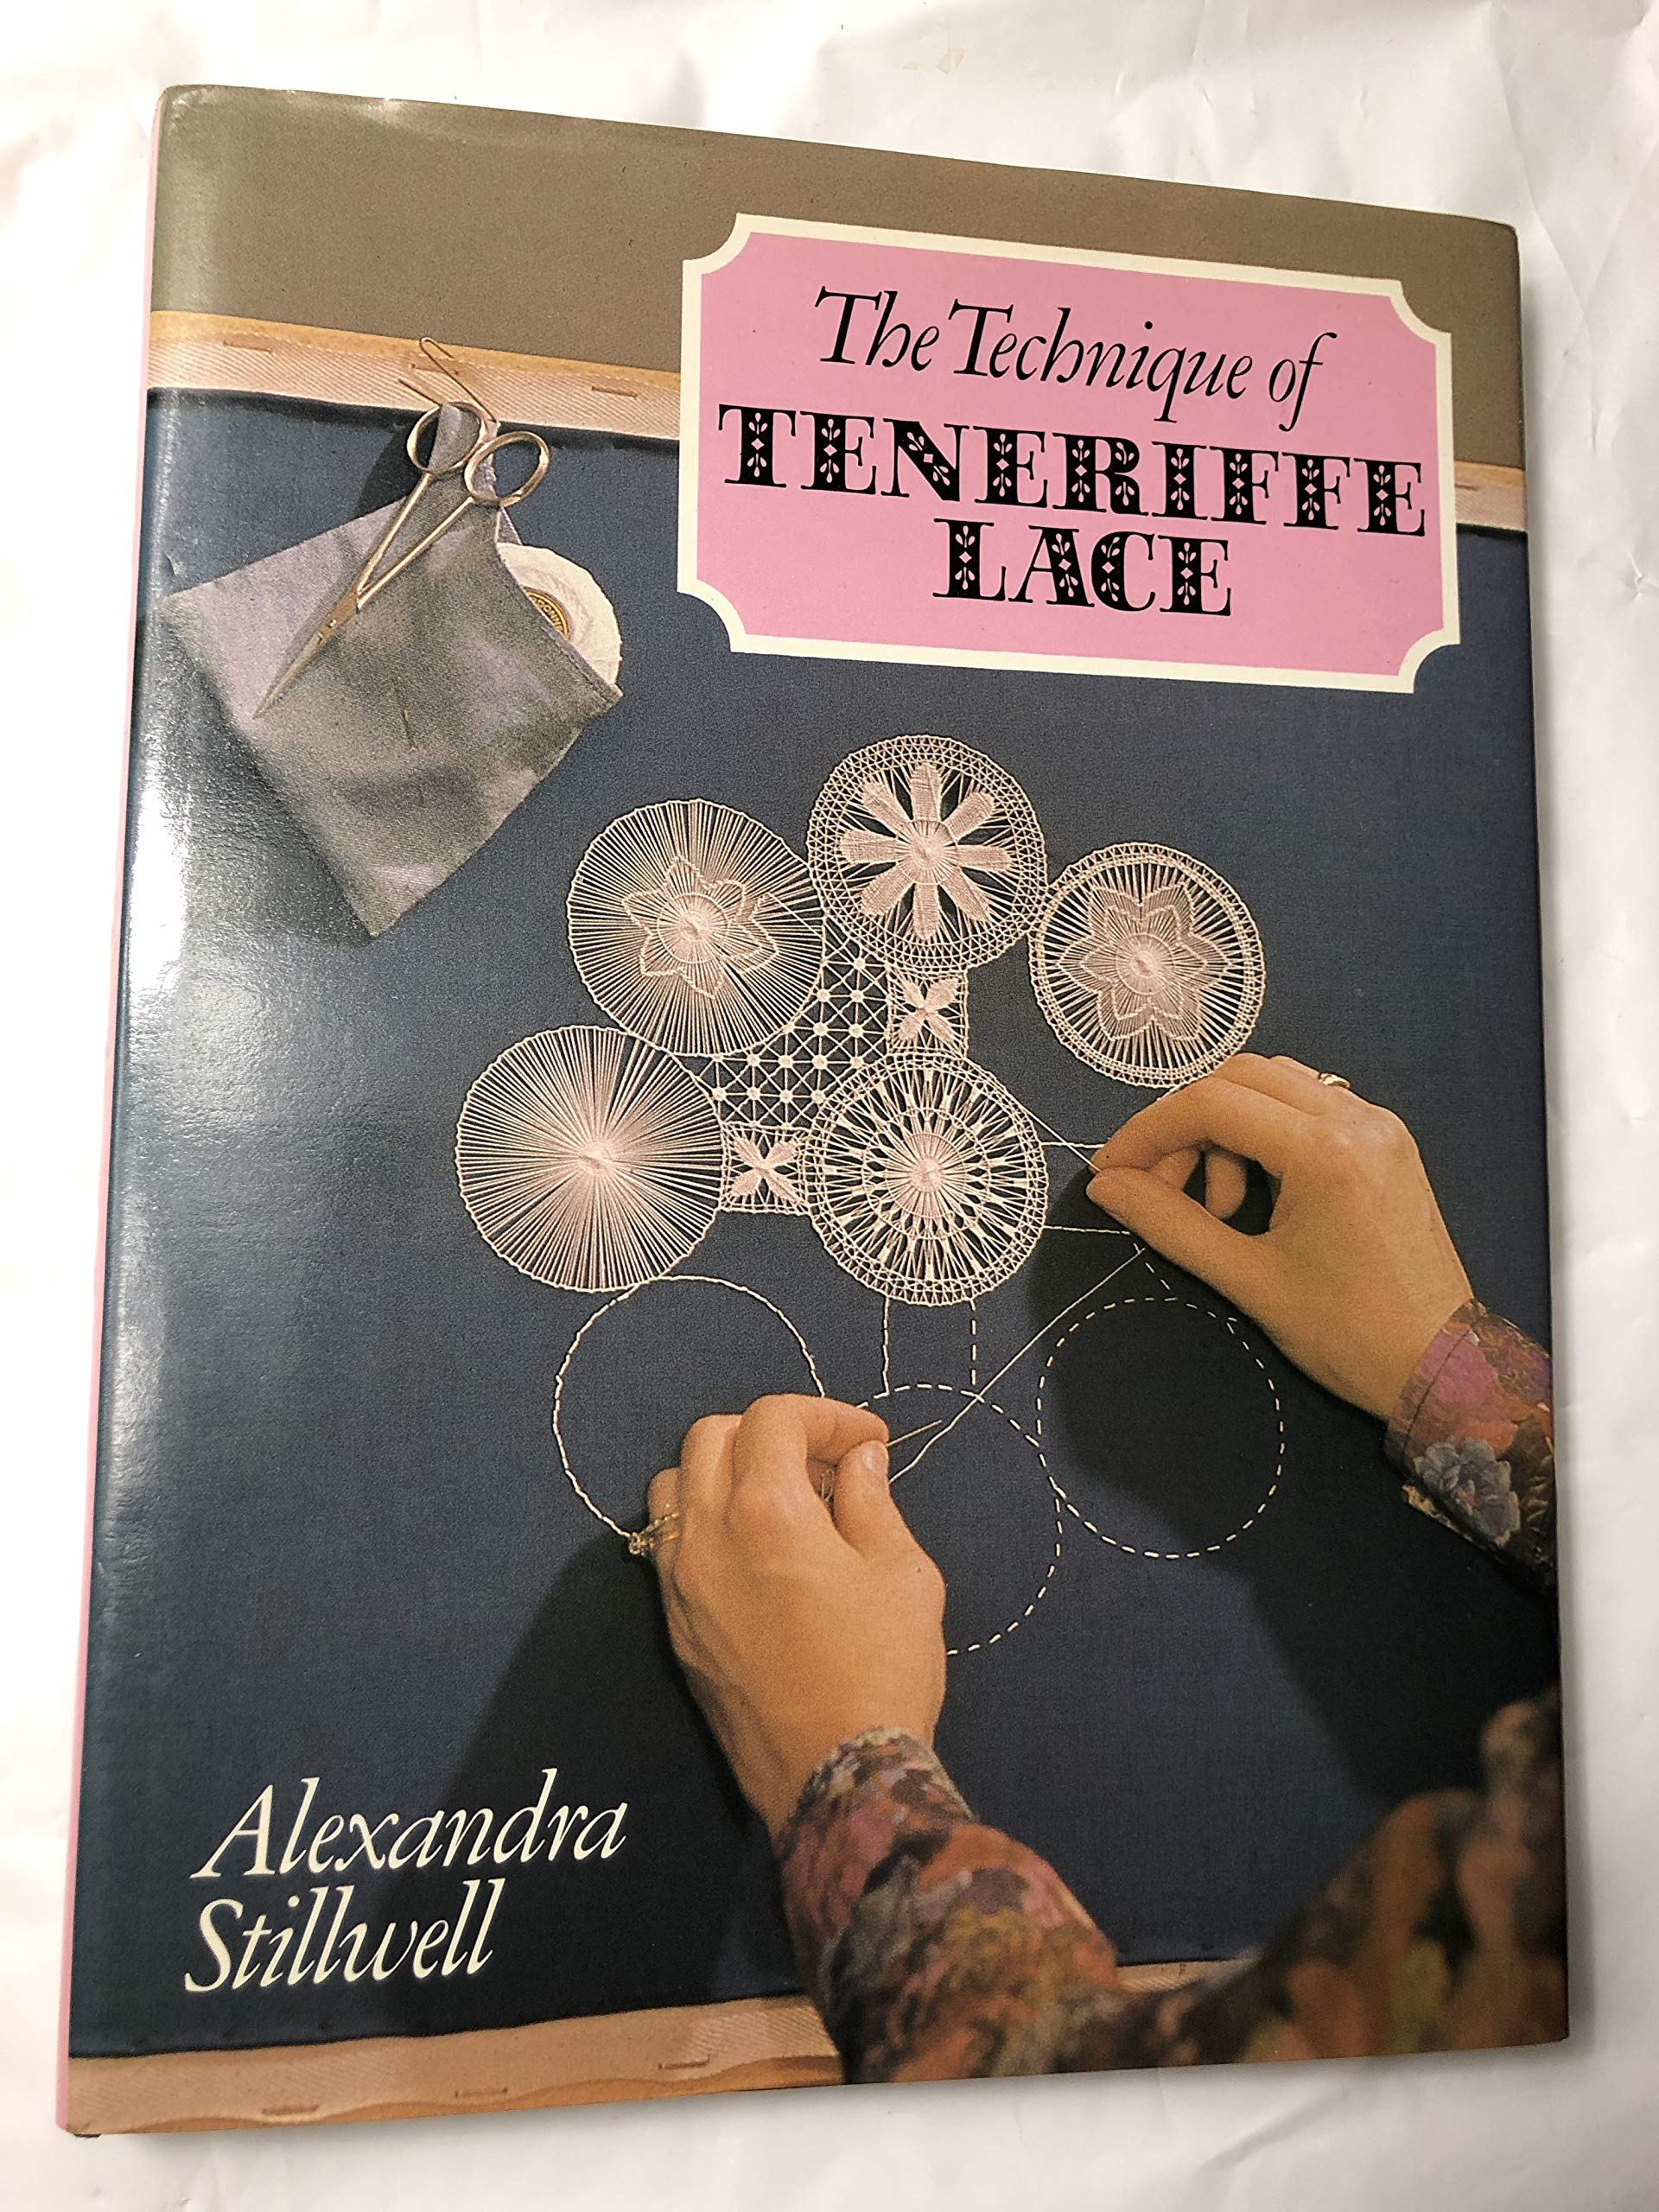 Amazon.com: The Technique of Teneriffe [Tenerife] Lace ...